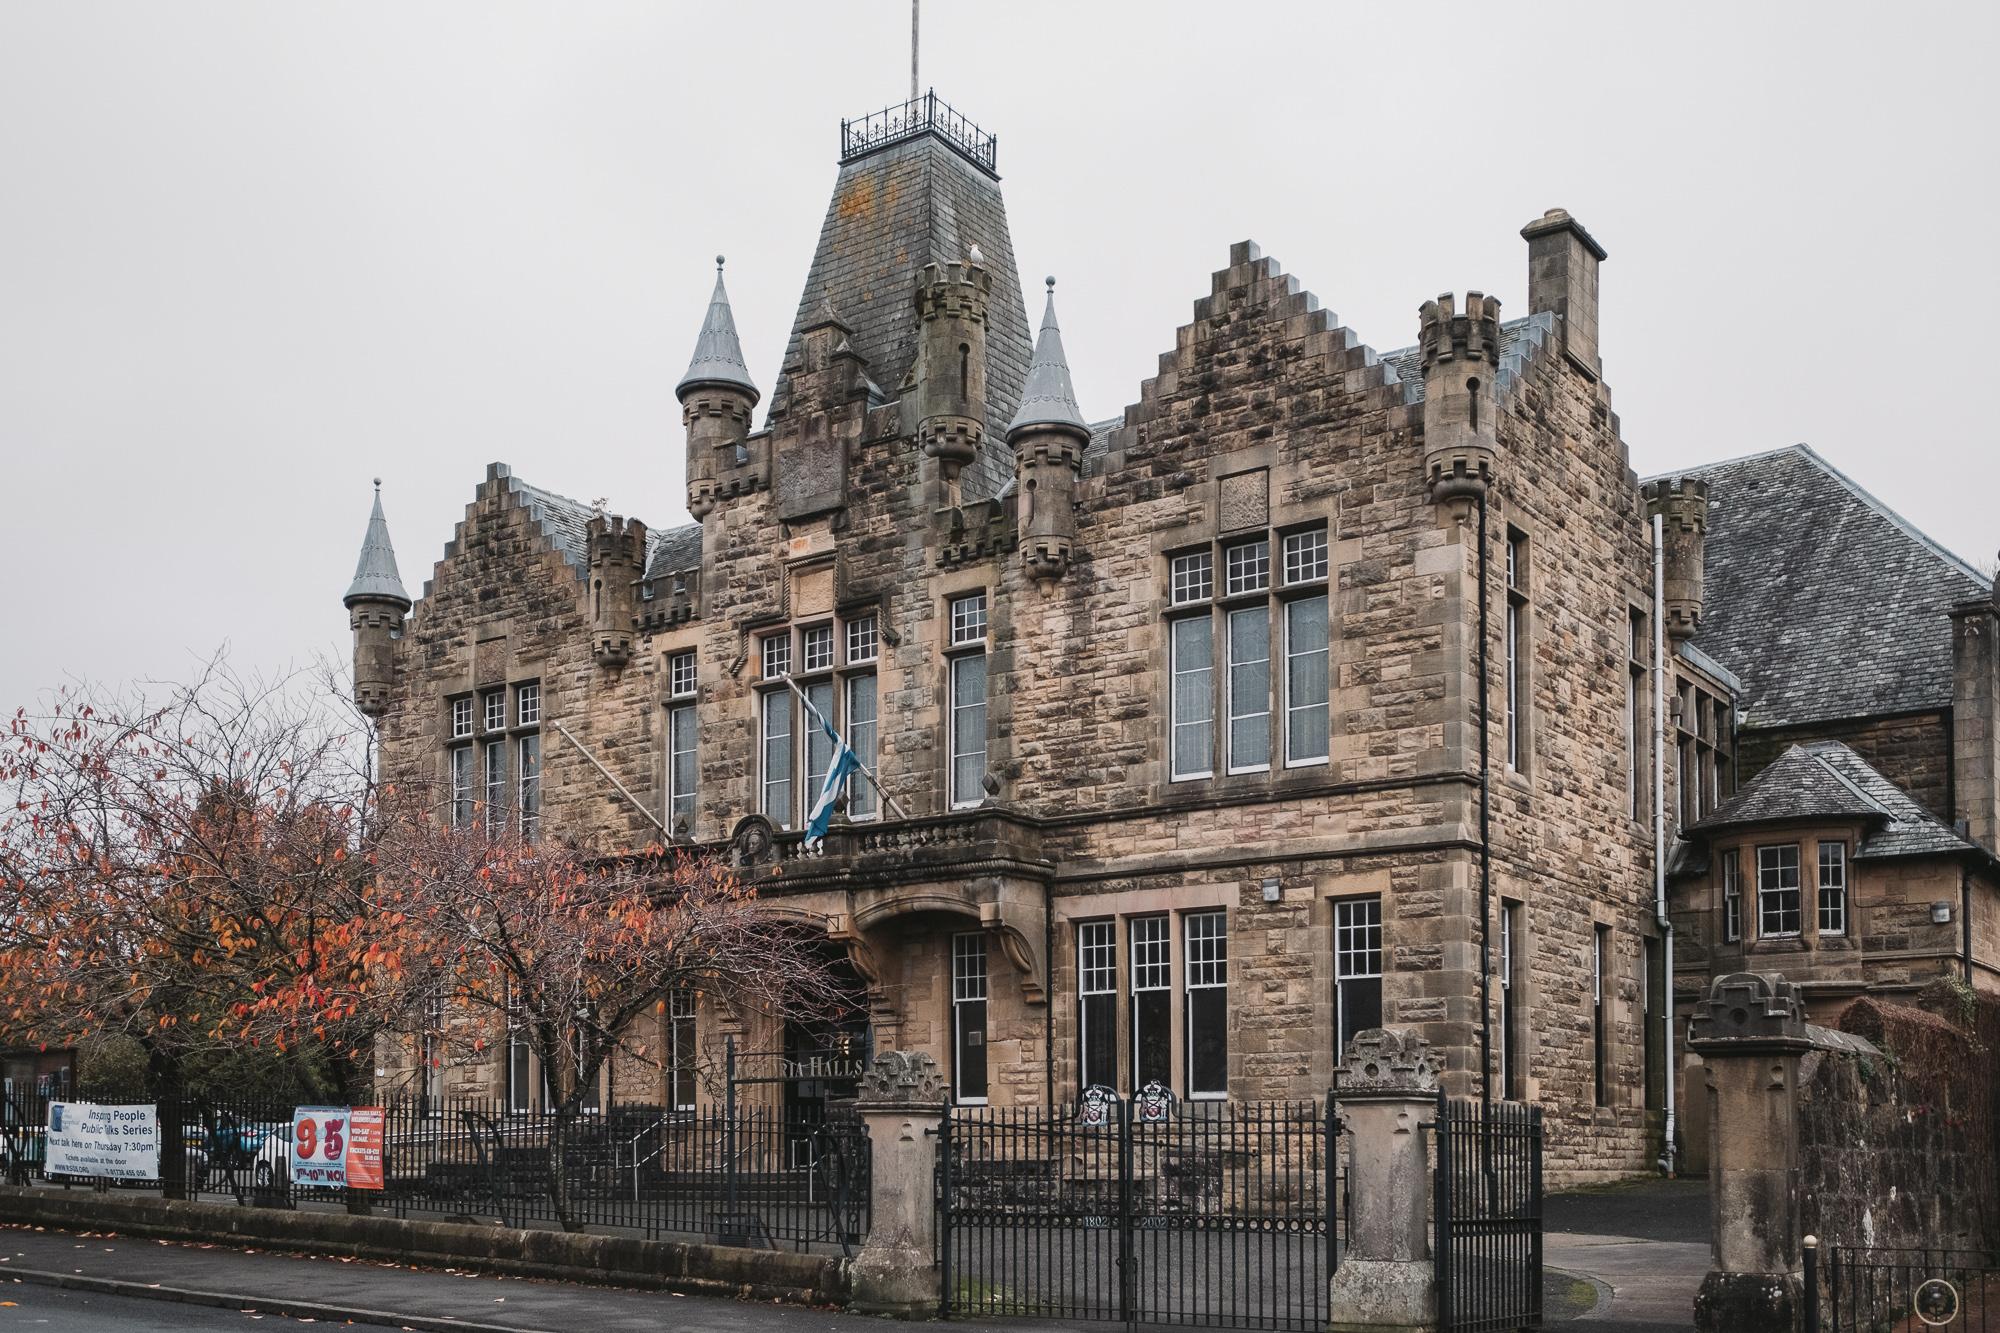 Victoria Halls in Scottish Baronial style